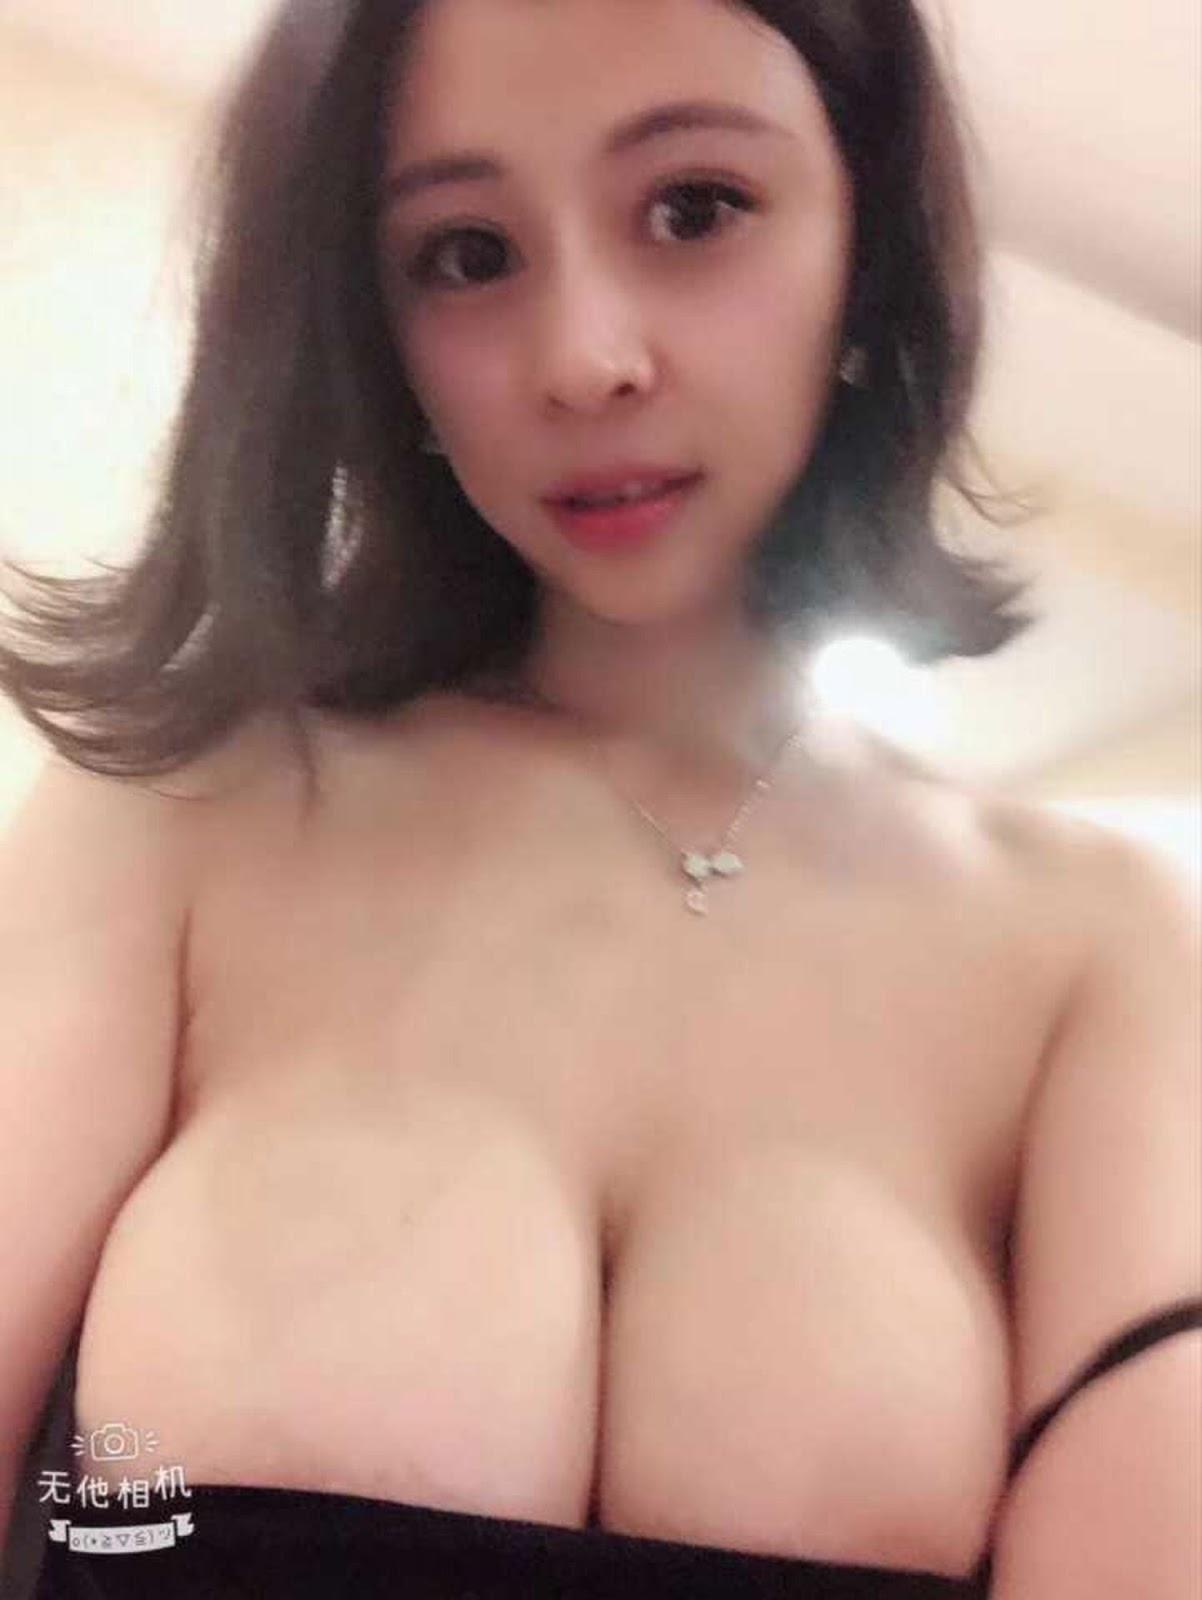 aHR0cHM6Ly93d3cubXlteXBpYy5uZXQvZGF0YS9hdHRhY2htZW50L2ZvcnVtLzIwMTkwOC8yMC8wODM0NDNweW9pdXB3eXA0bHV2dnRmLmpwZy50aHVtYi5qcGc%253D - 成都瓶儿 - Chengdu Pinger big tits selfie nude 2020